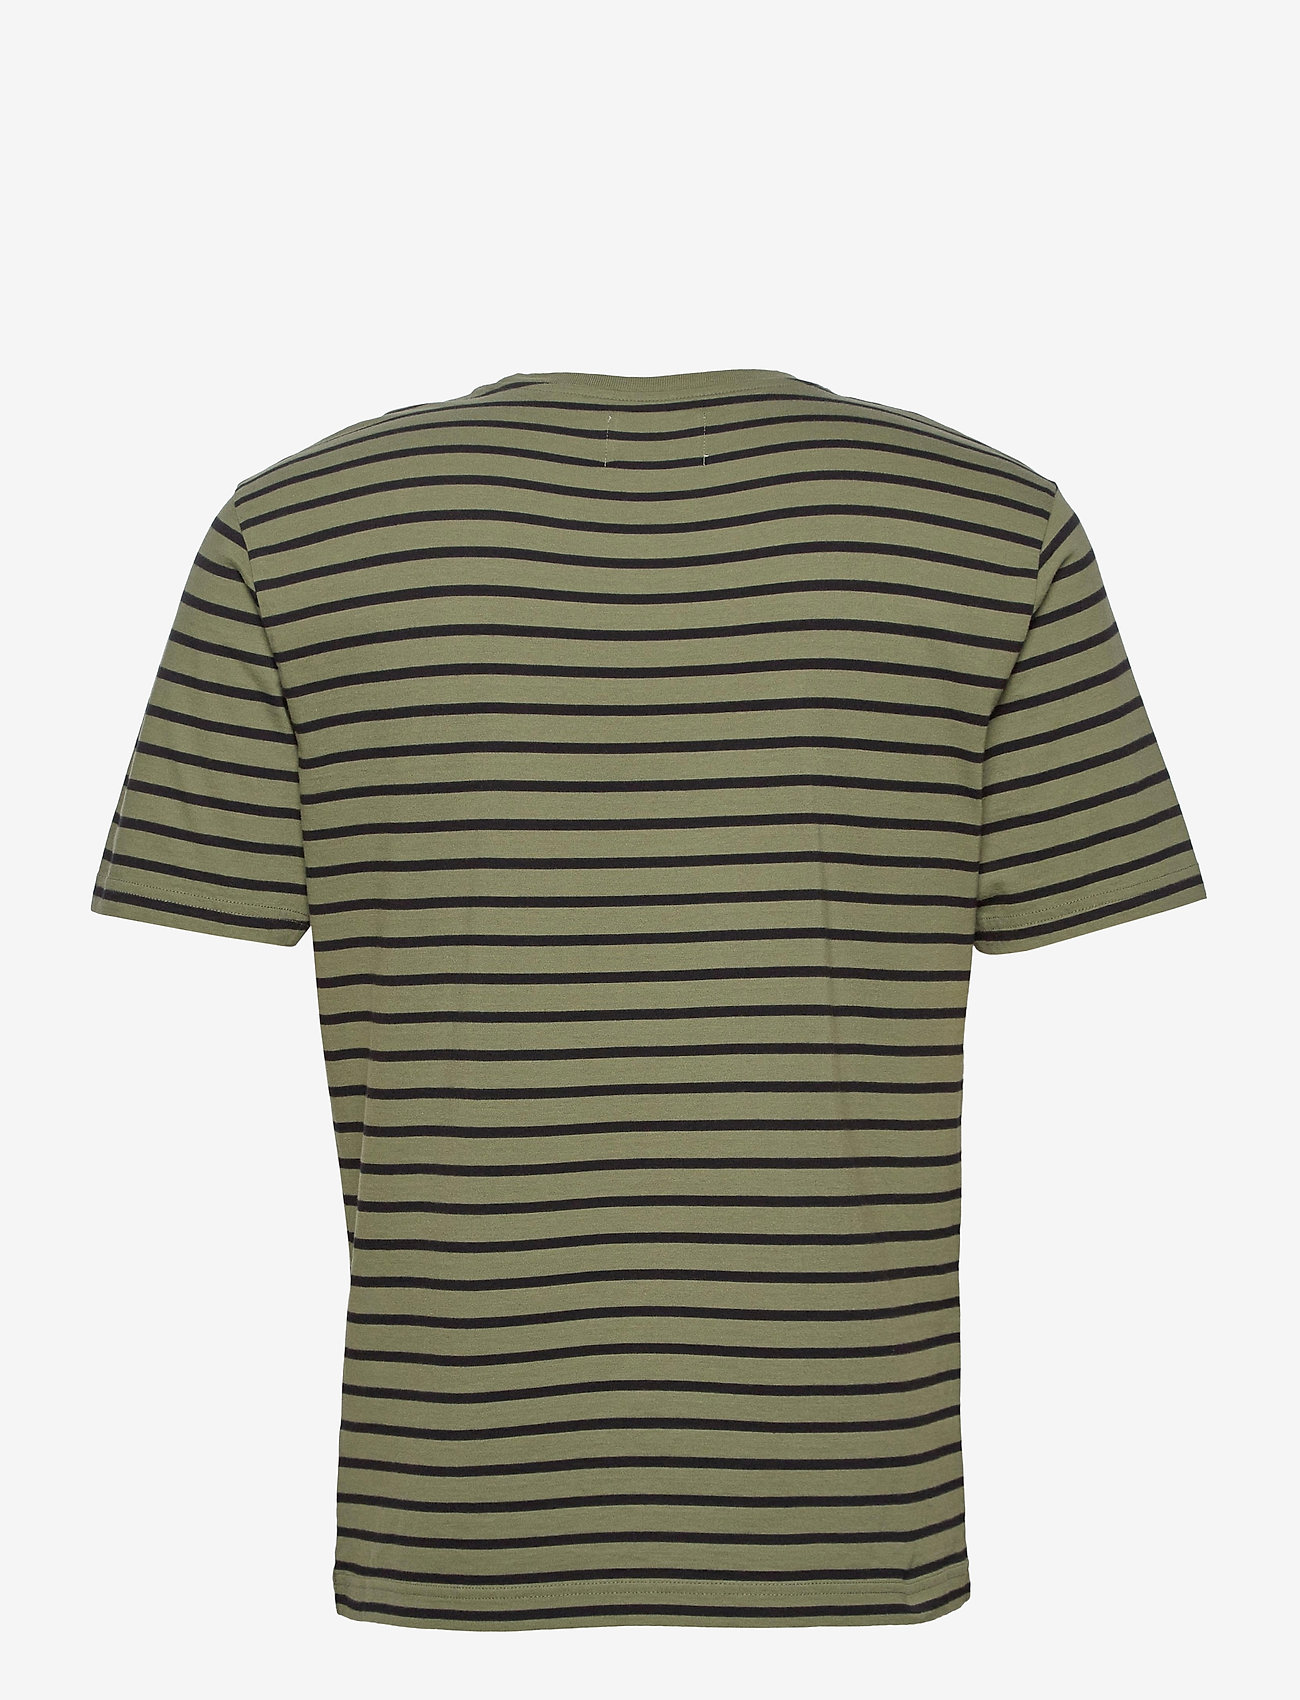 Wood Wood Ace T-shirt - T-skjorter ARMY/BLACK STRIPES - Menn Klær